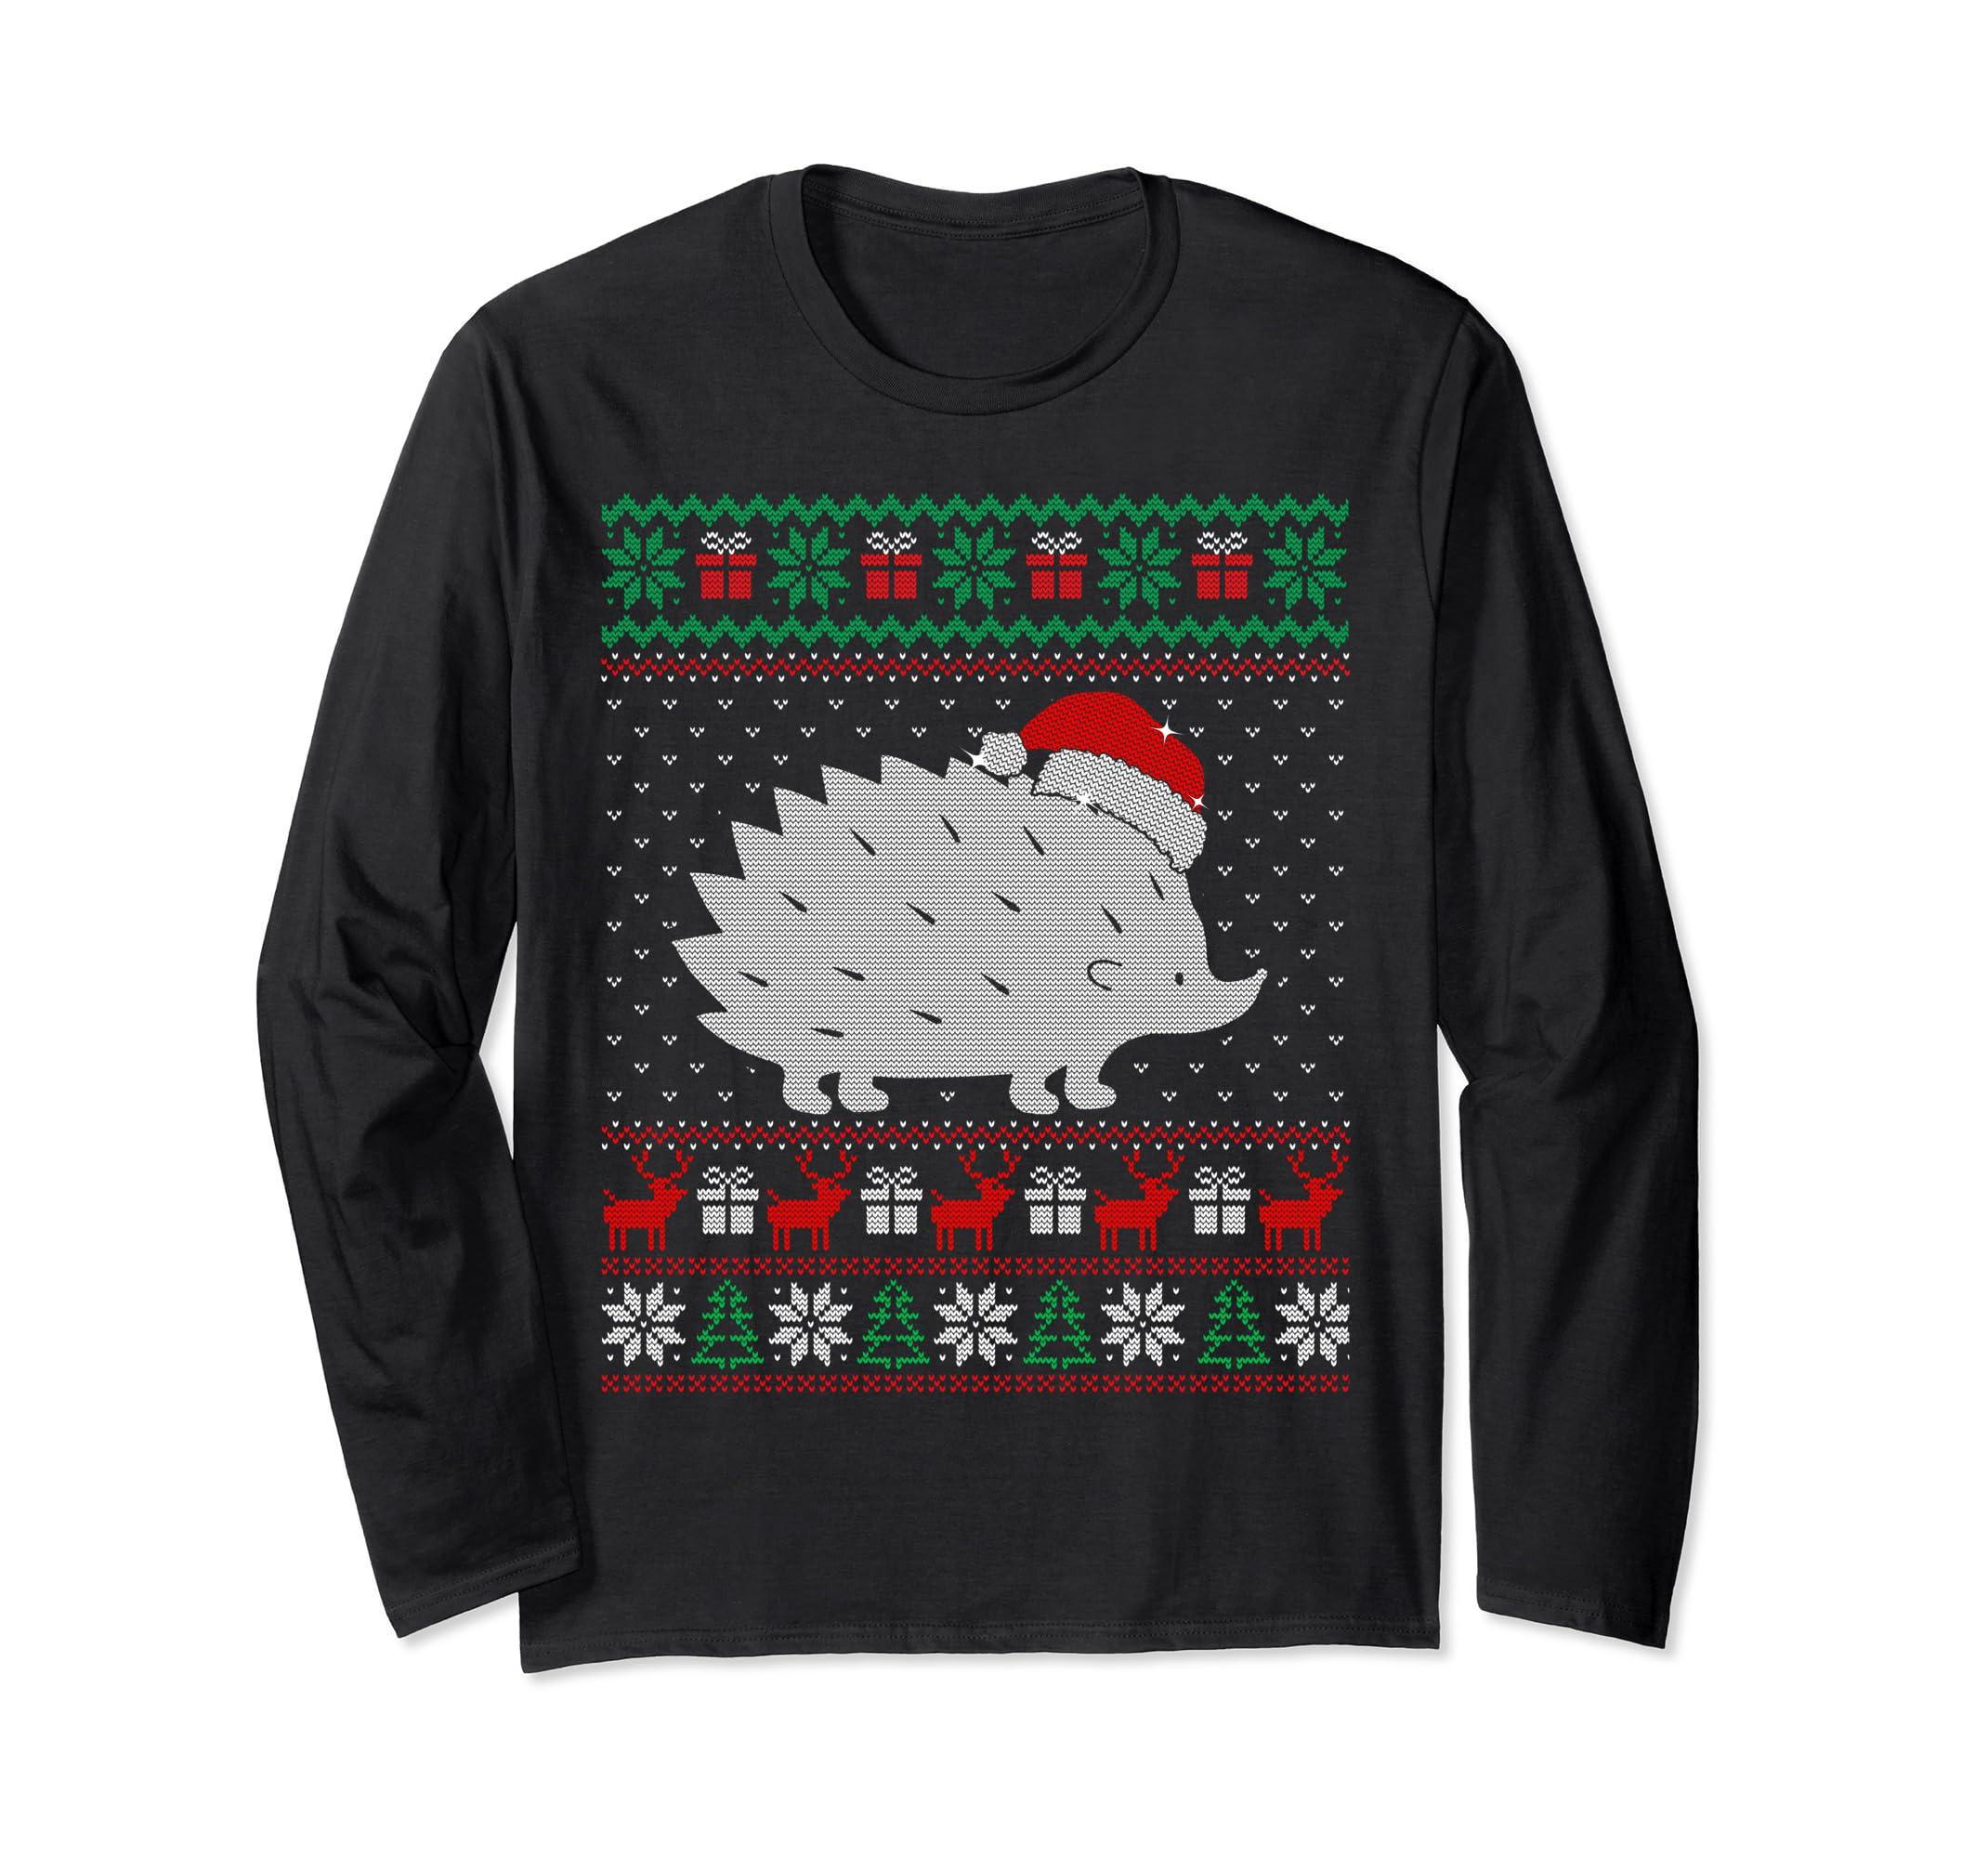 Hedgehog Christmas Jumper.Amazon Com Hedgehog Ugly Christmas Sweater Unisex Long